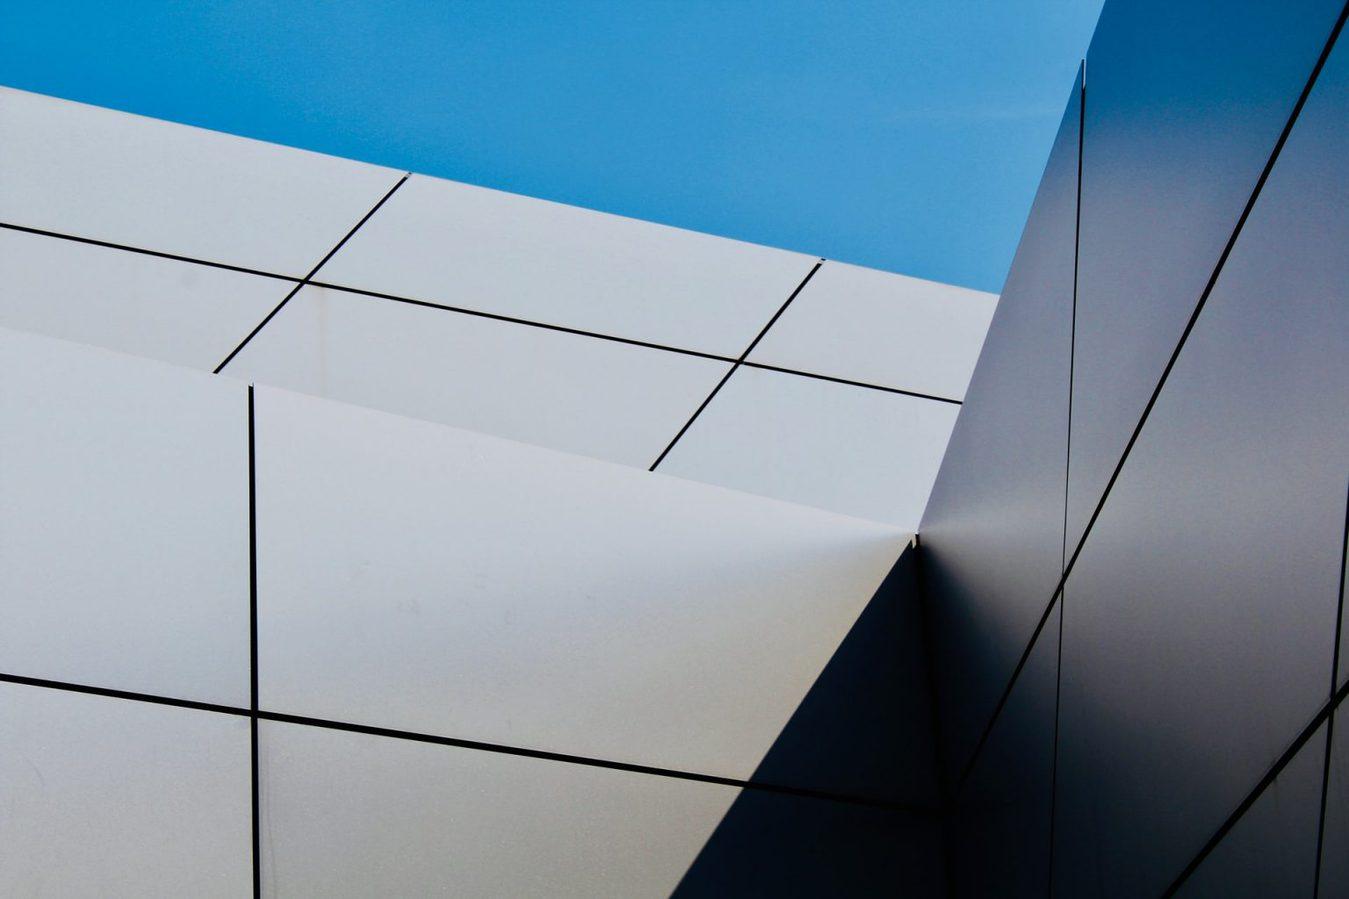 Arquitetura abstrata